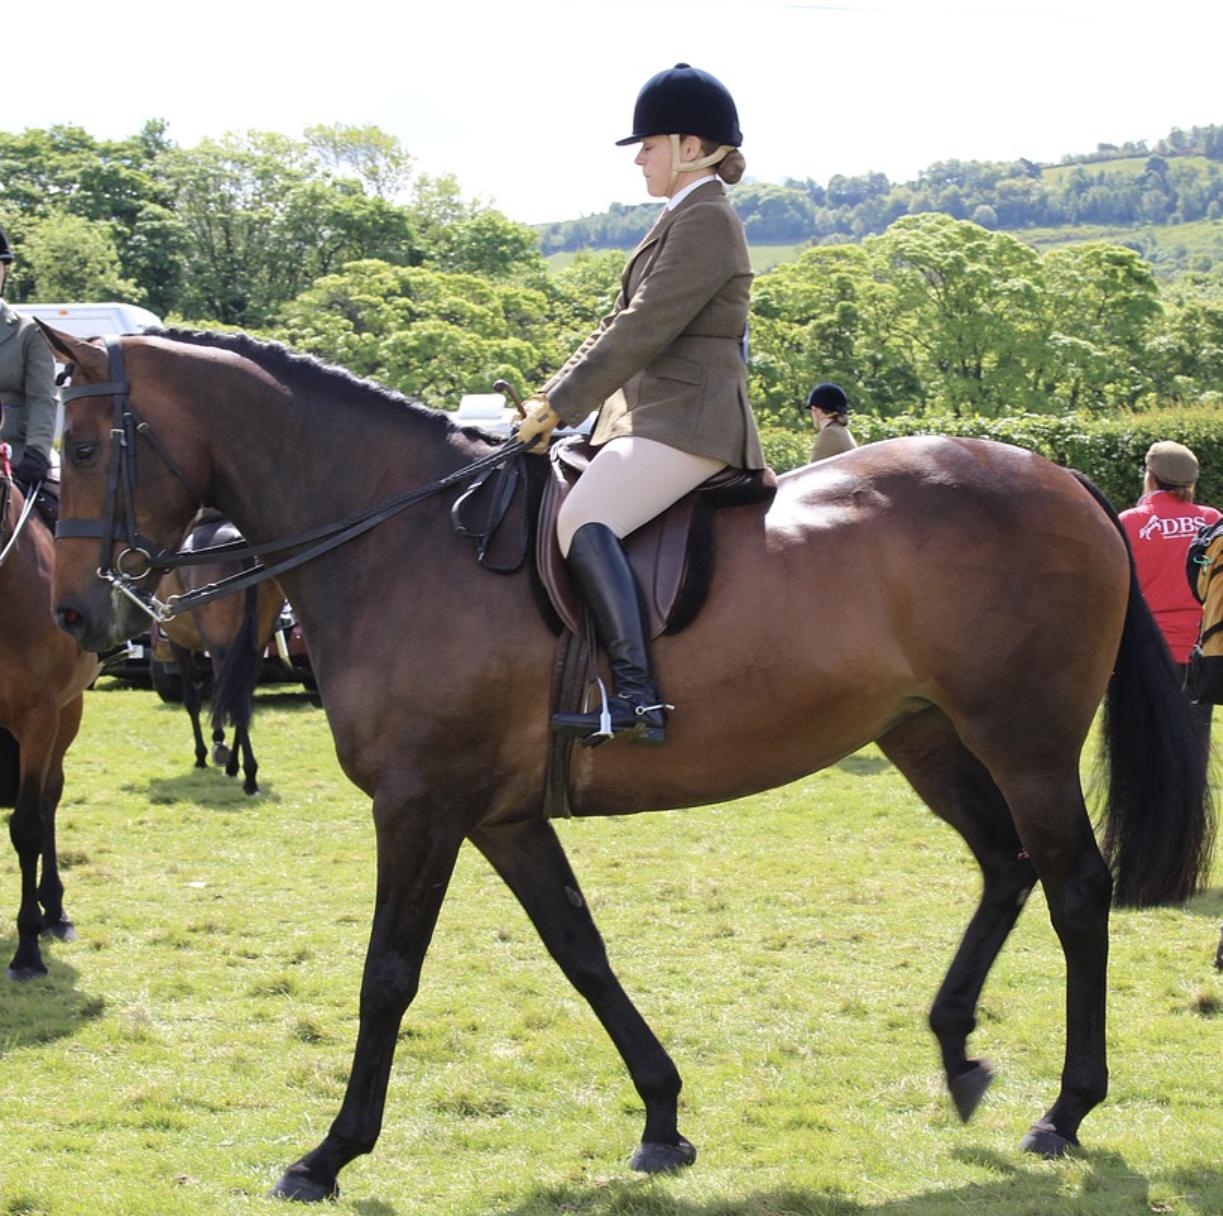 Woman rides a bay horse at a show